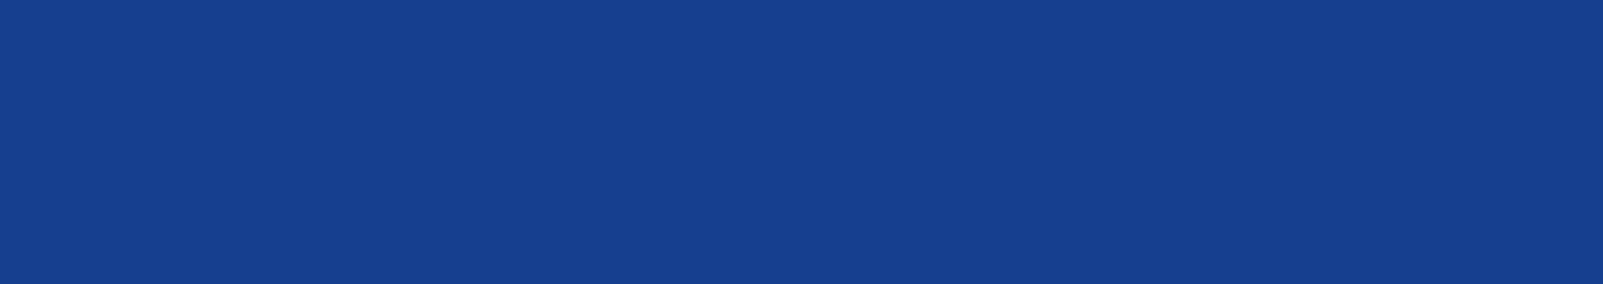 PonoPono(ポノポノ)